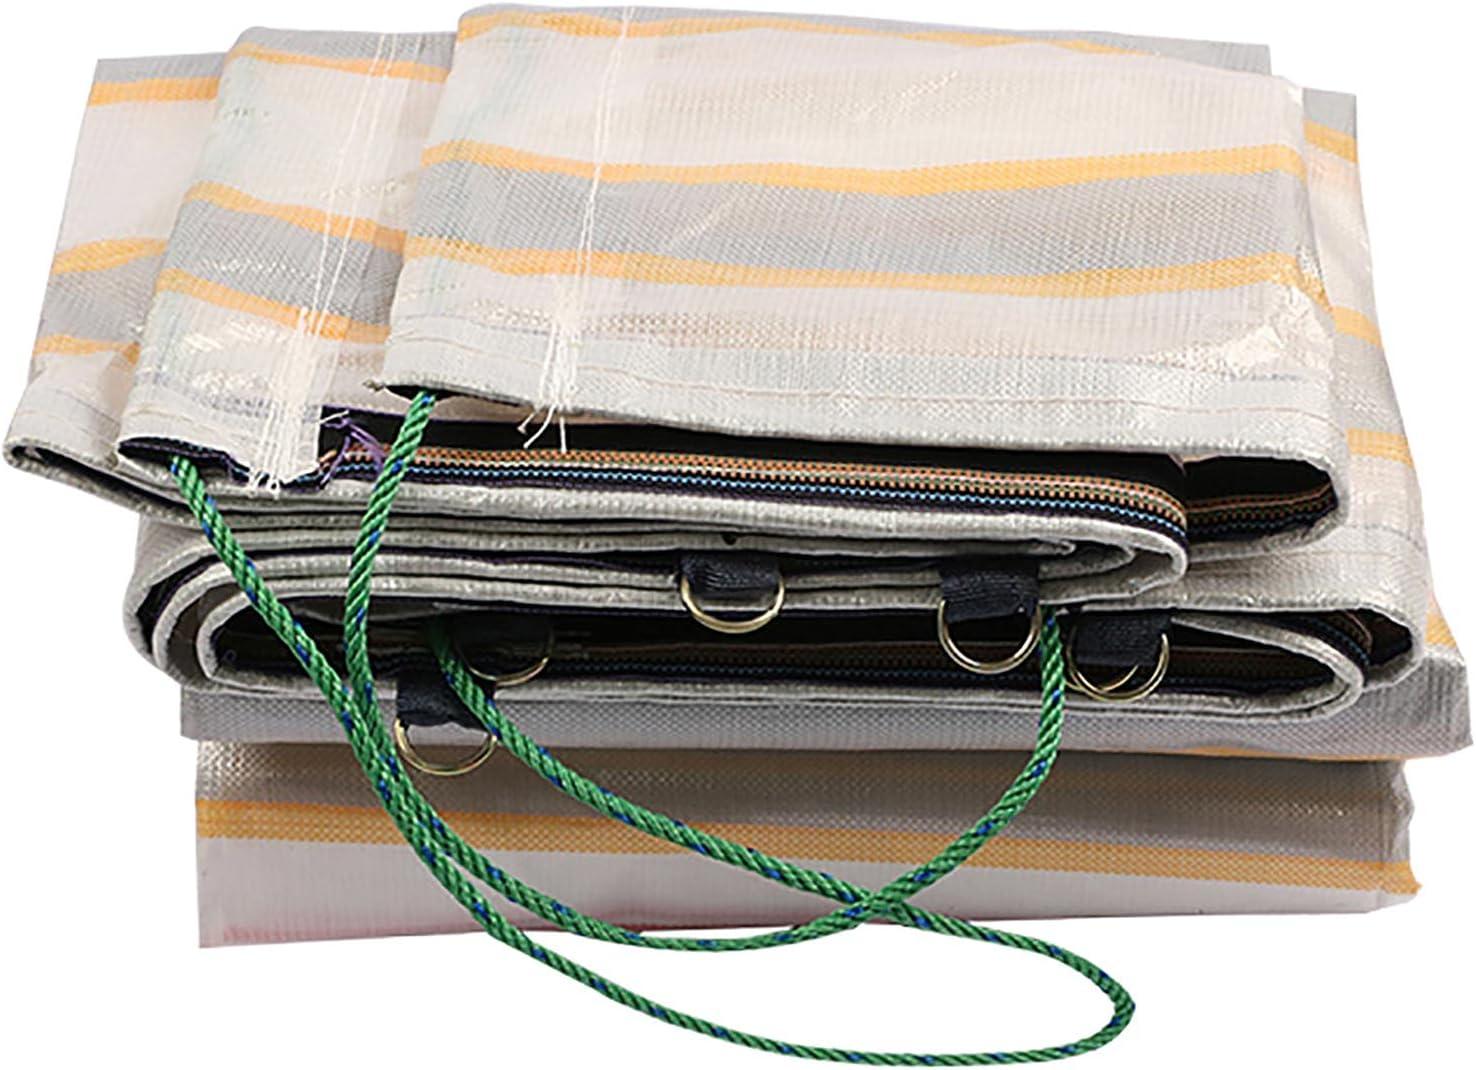 WXZX Import Plastic Tarps UV Resistant Sheet Multi- Cover Indianapolis Mall Tarp